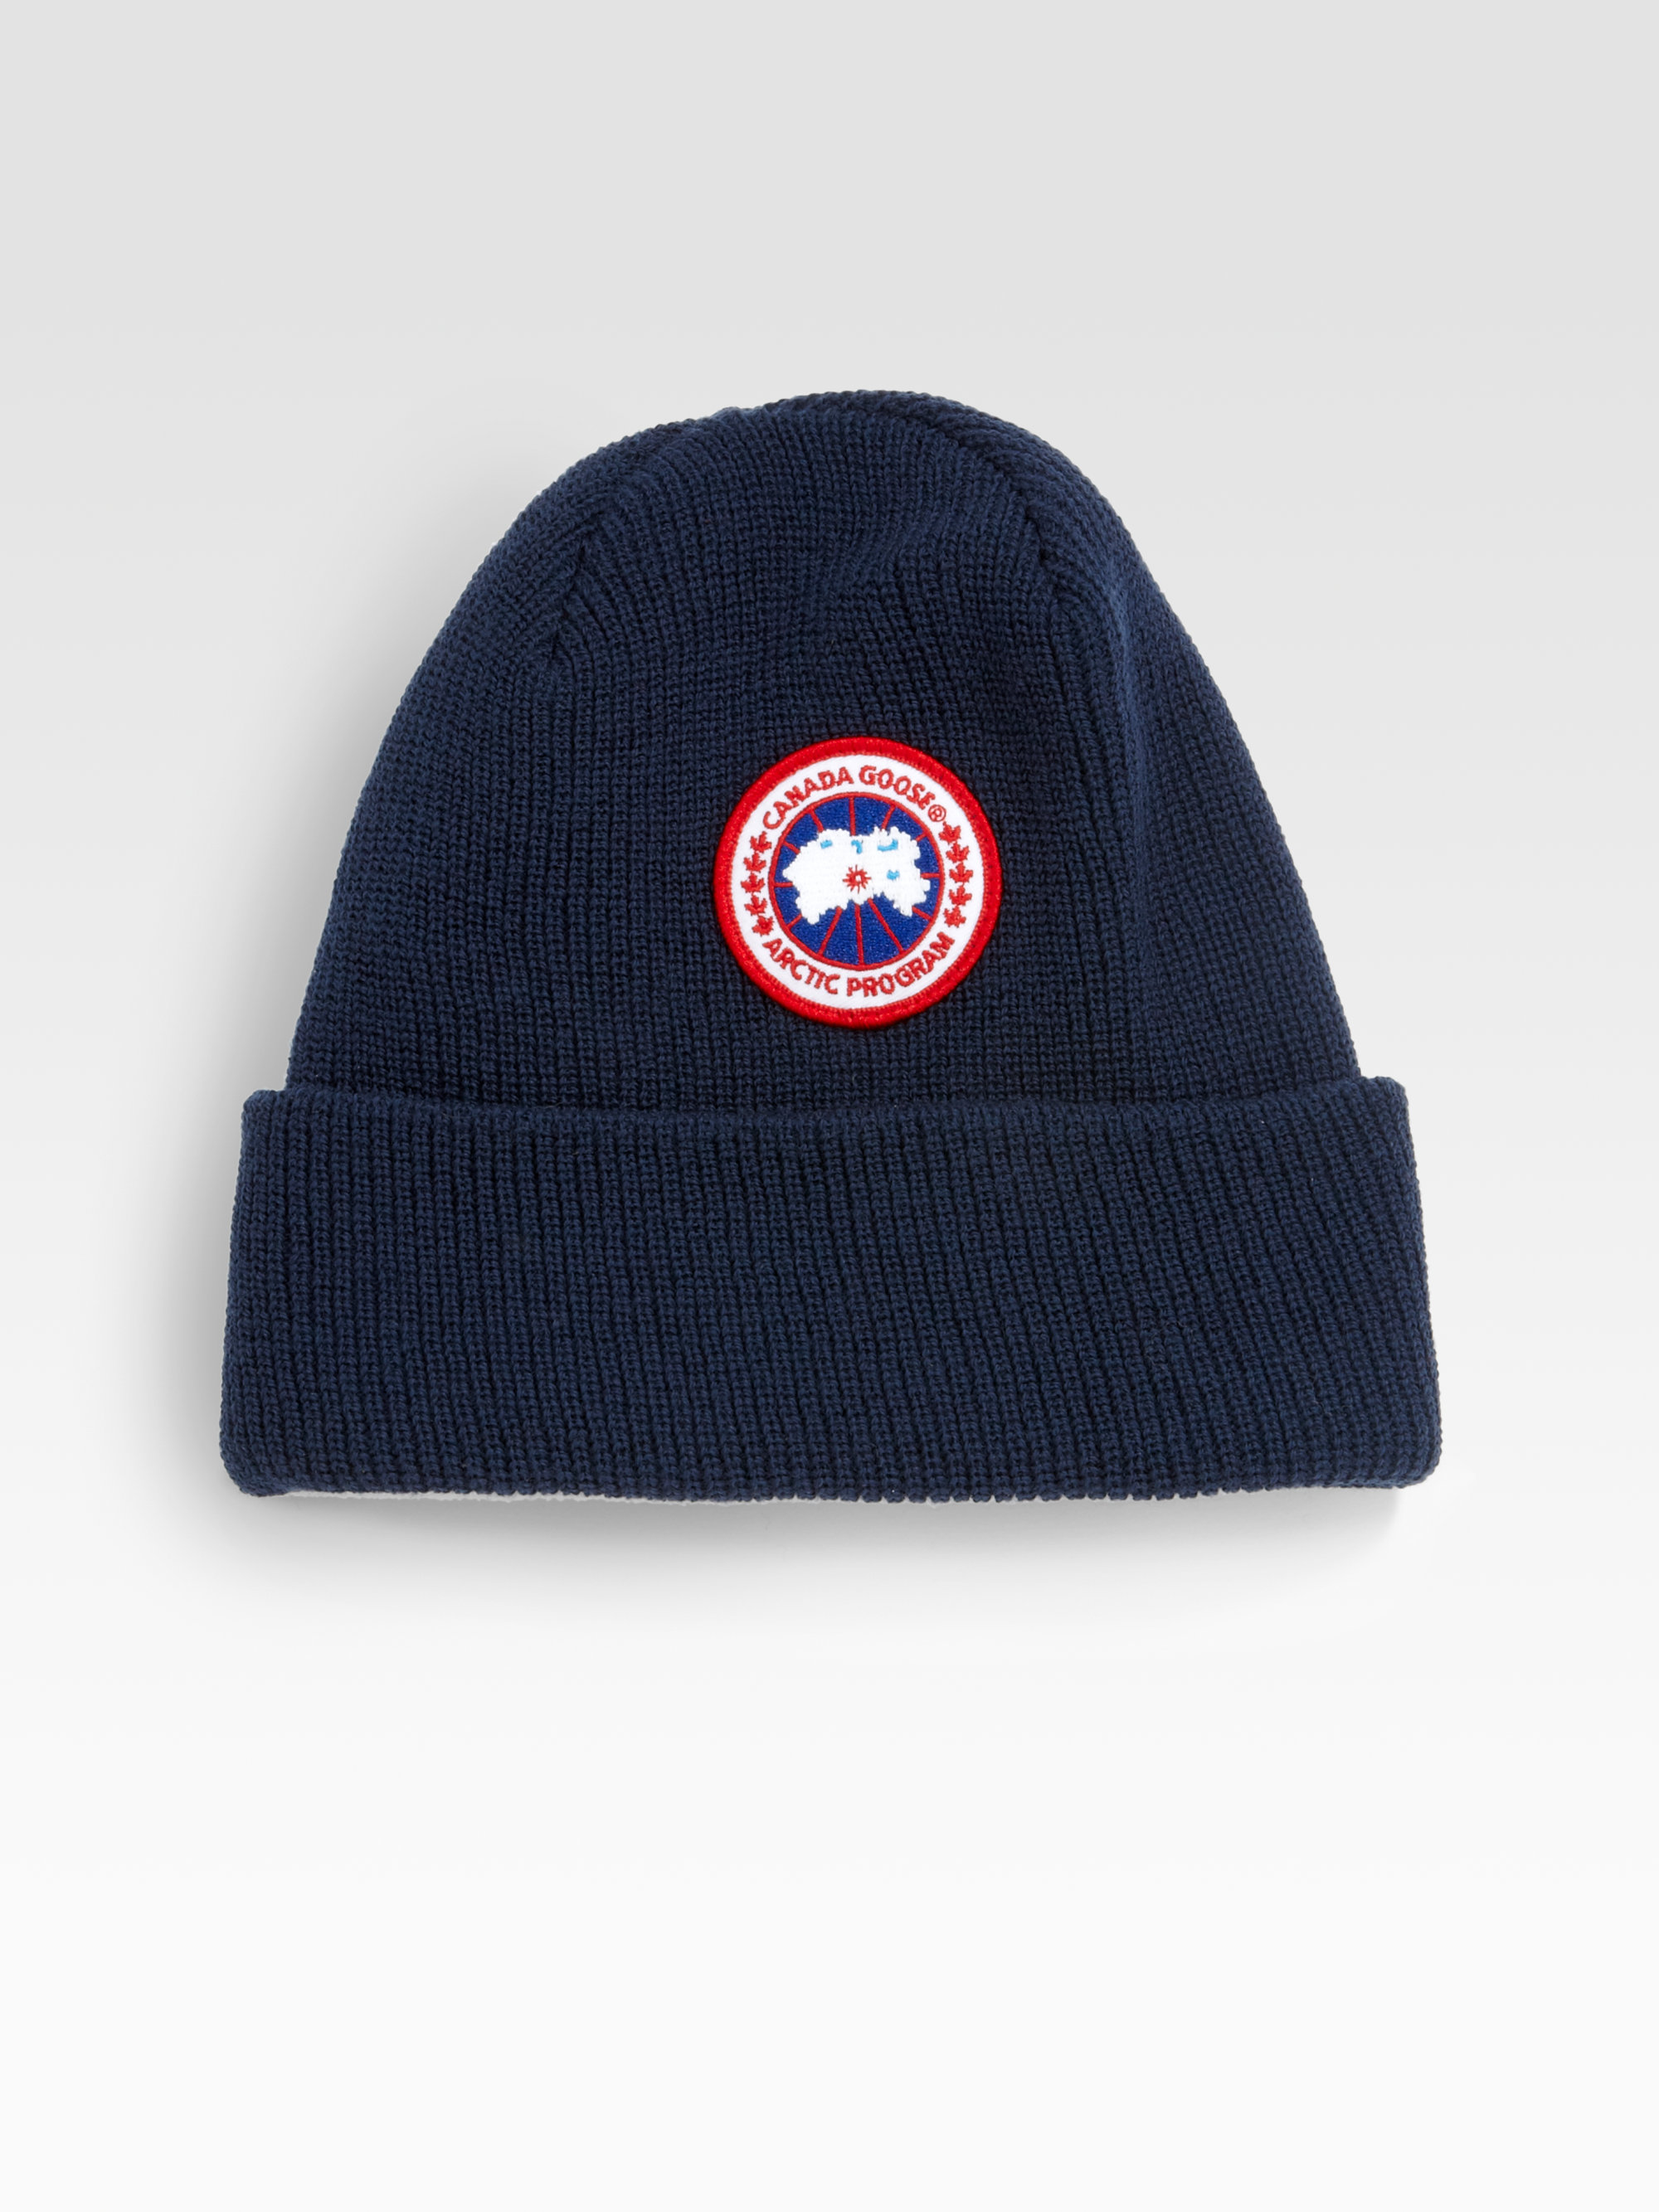 Lyst - Canada Goose Merino Wool Watch Cap in Blue for Men 504d30ec9ef